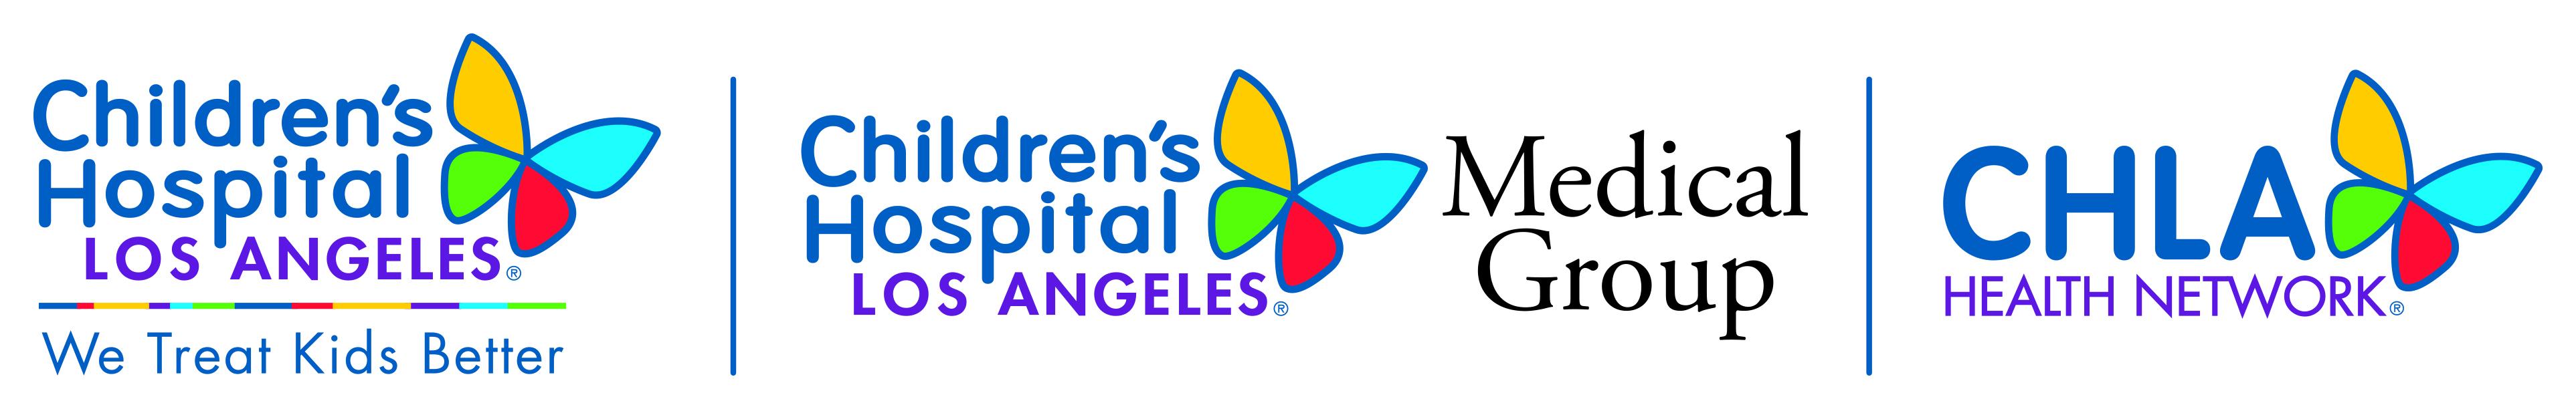 b7a8eb9504c6e newswise-fullscreen Children s Hospital Los Angeles Announces CHLA Health  Network — the Largest Pediatrician Network